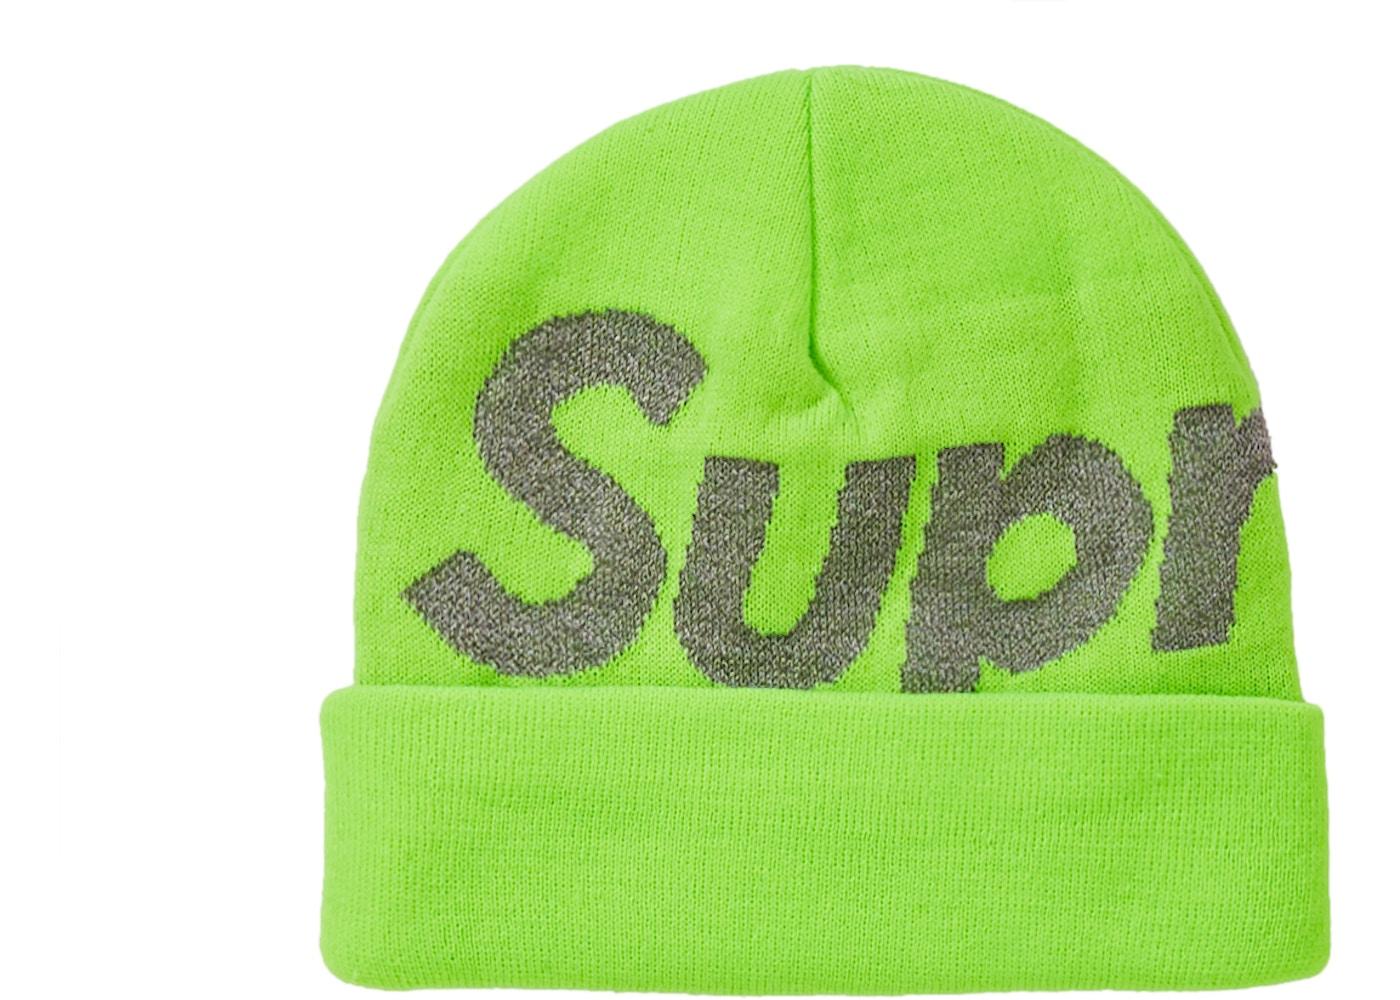 69a7038519b Supreme Big Logo Beanie (FW18) Bright Green. Big Logo Beanie